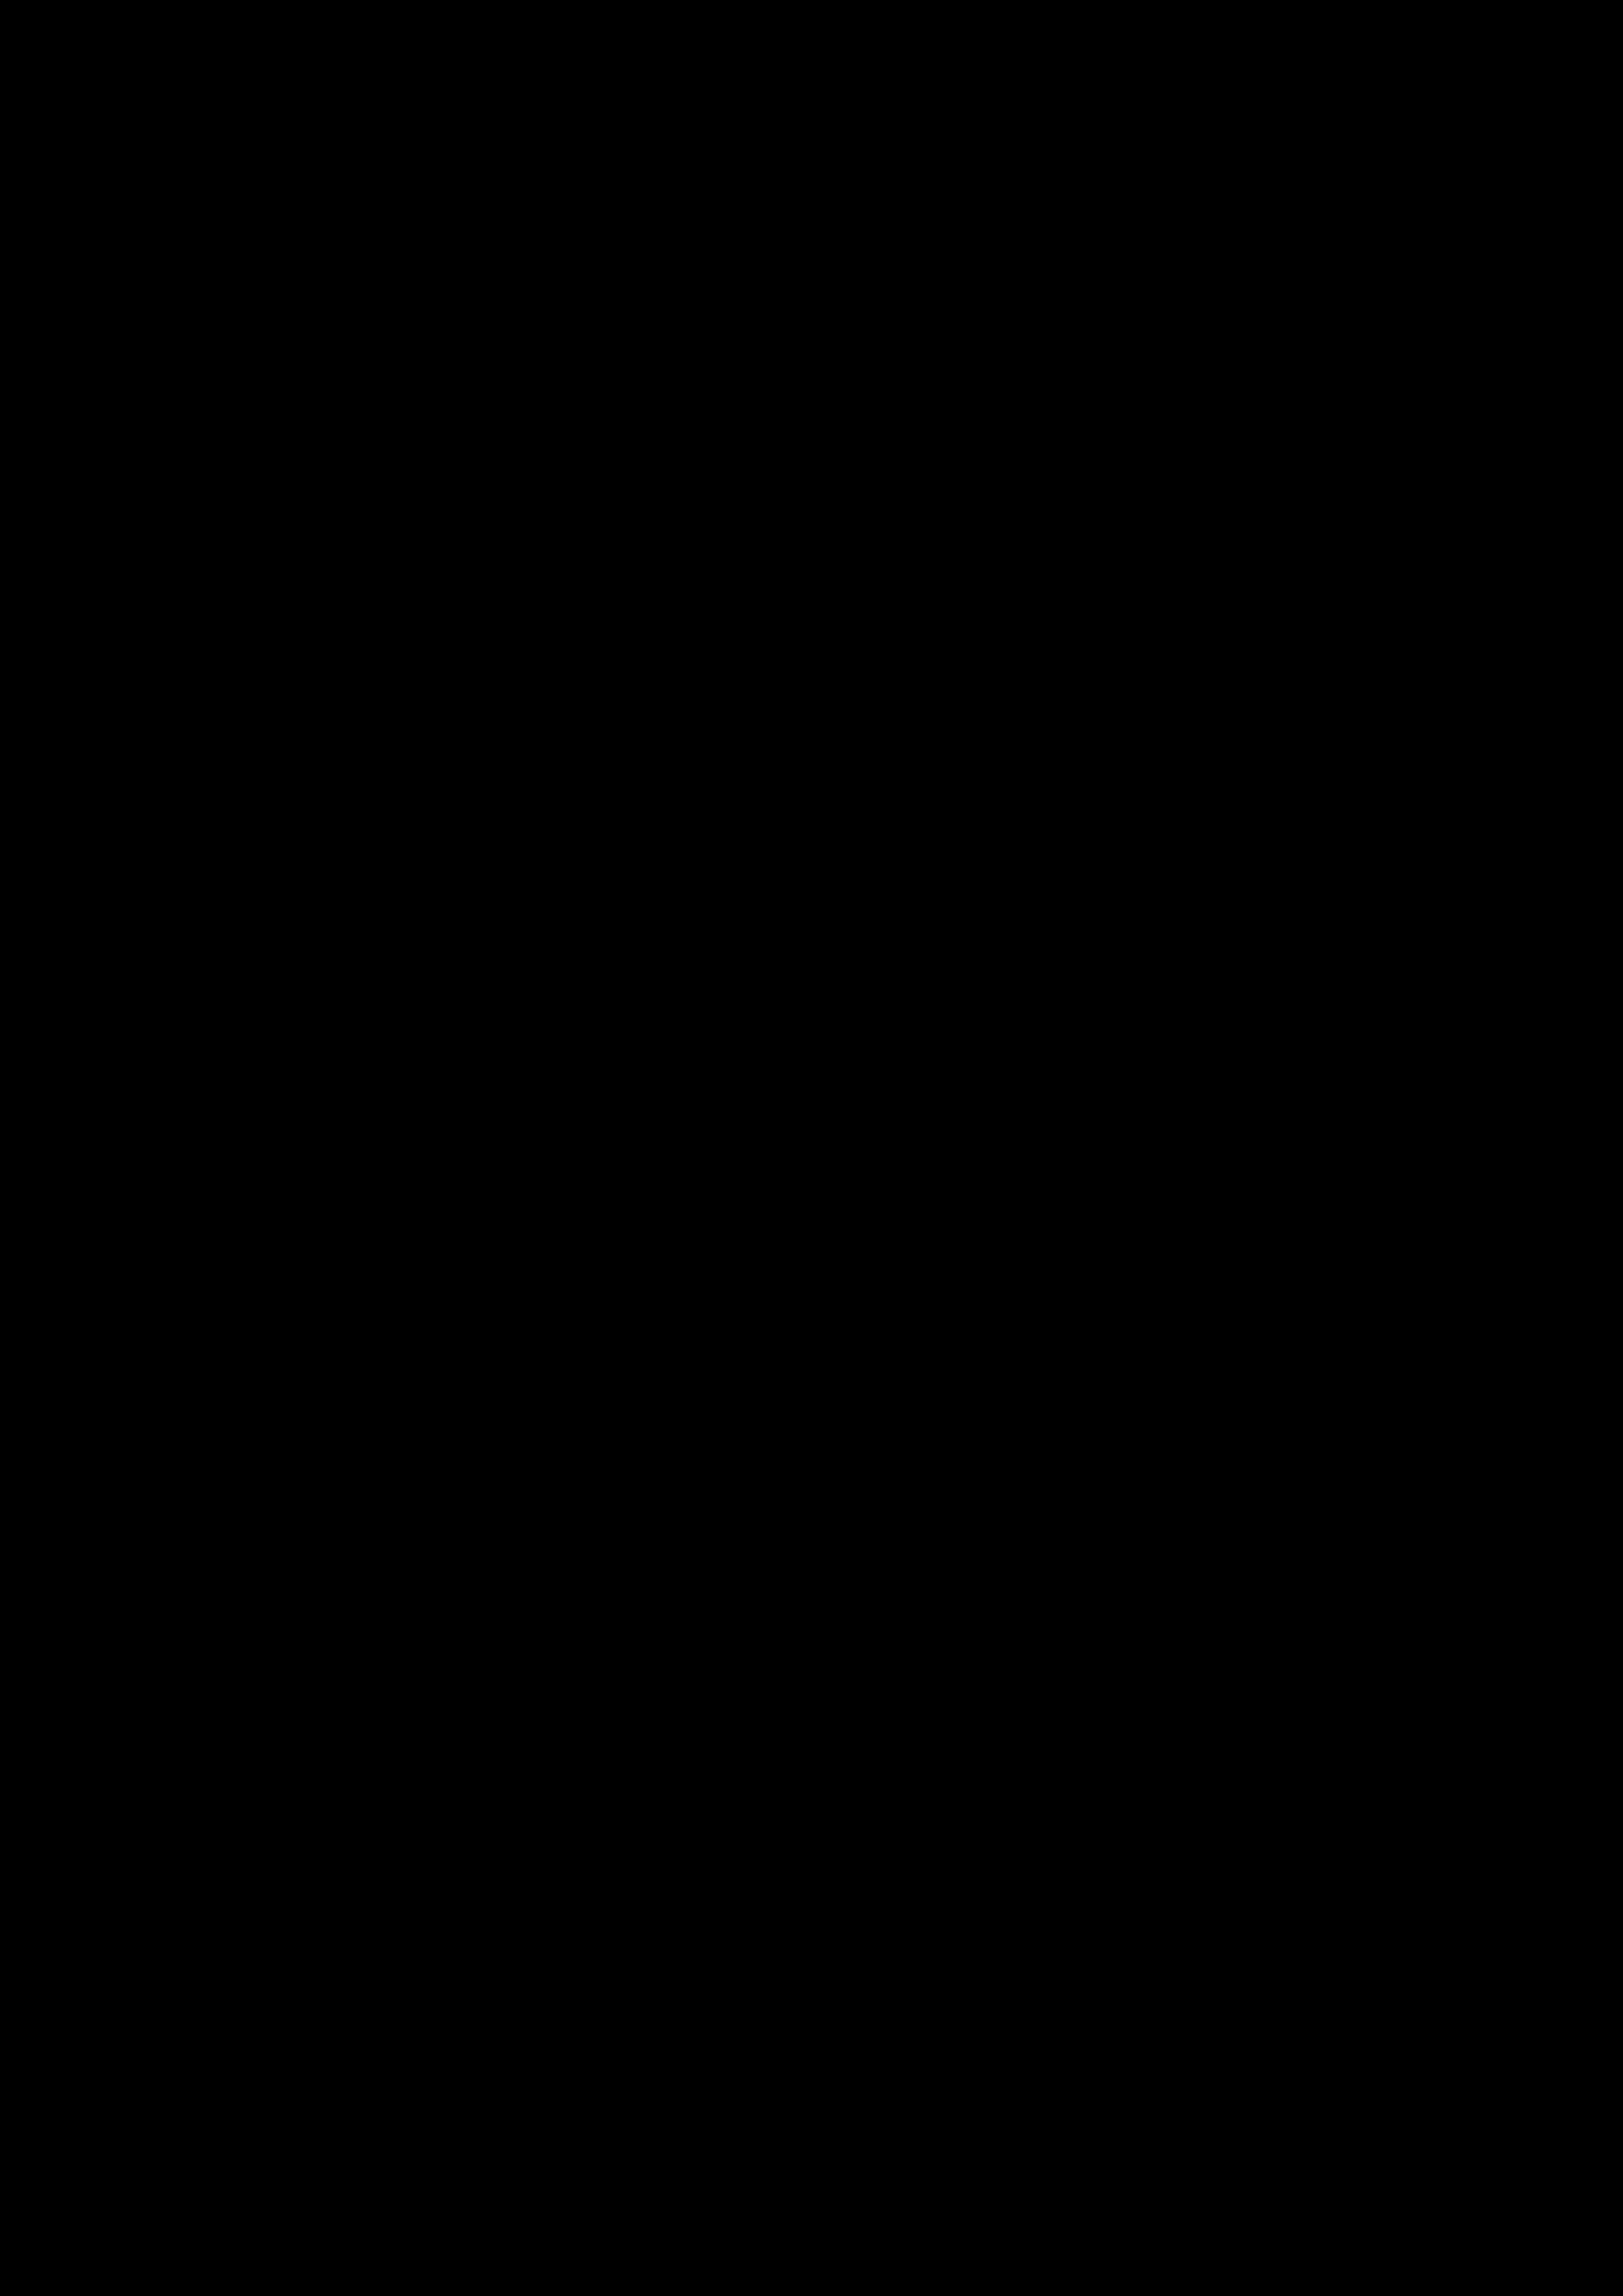 Clipart yin yang 2